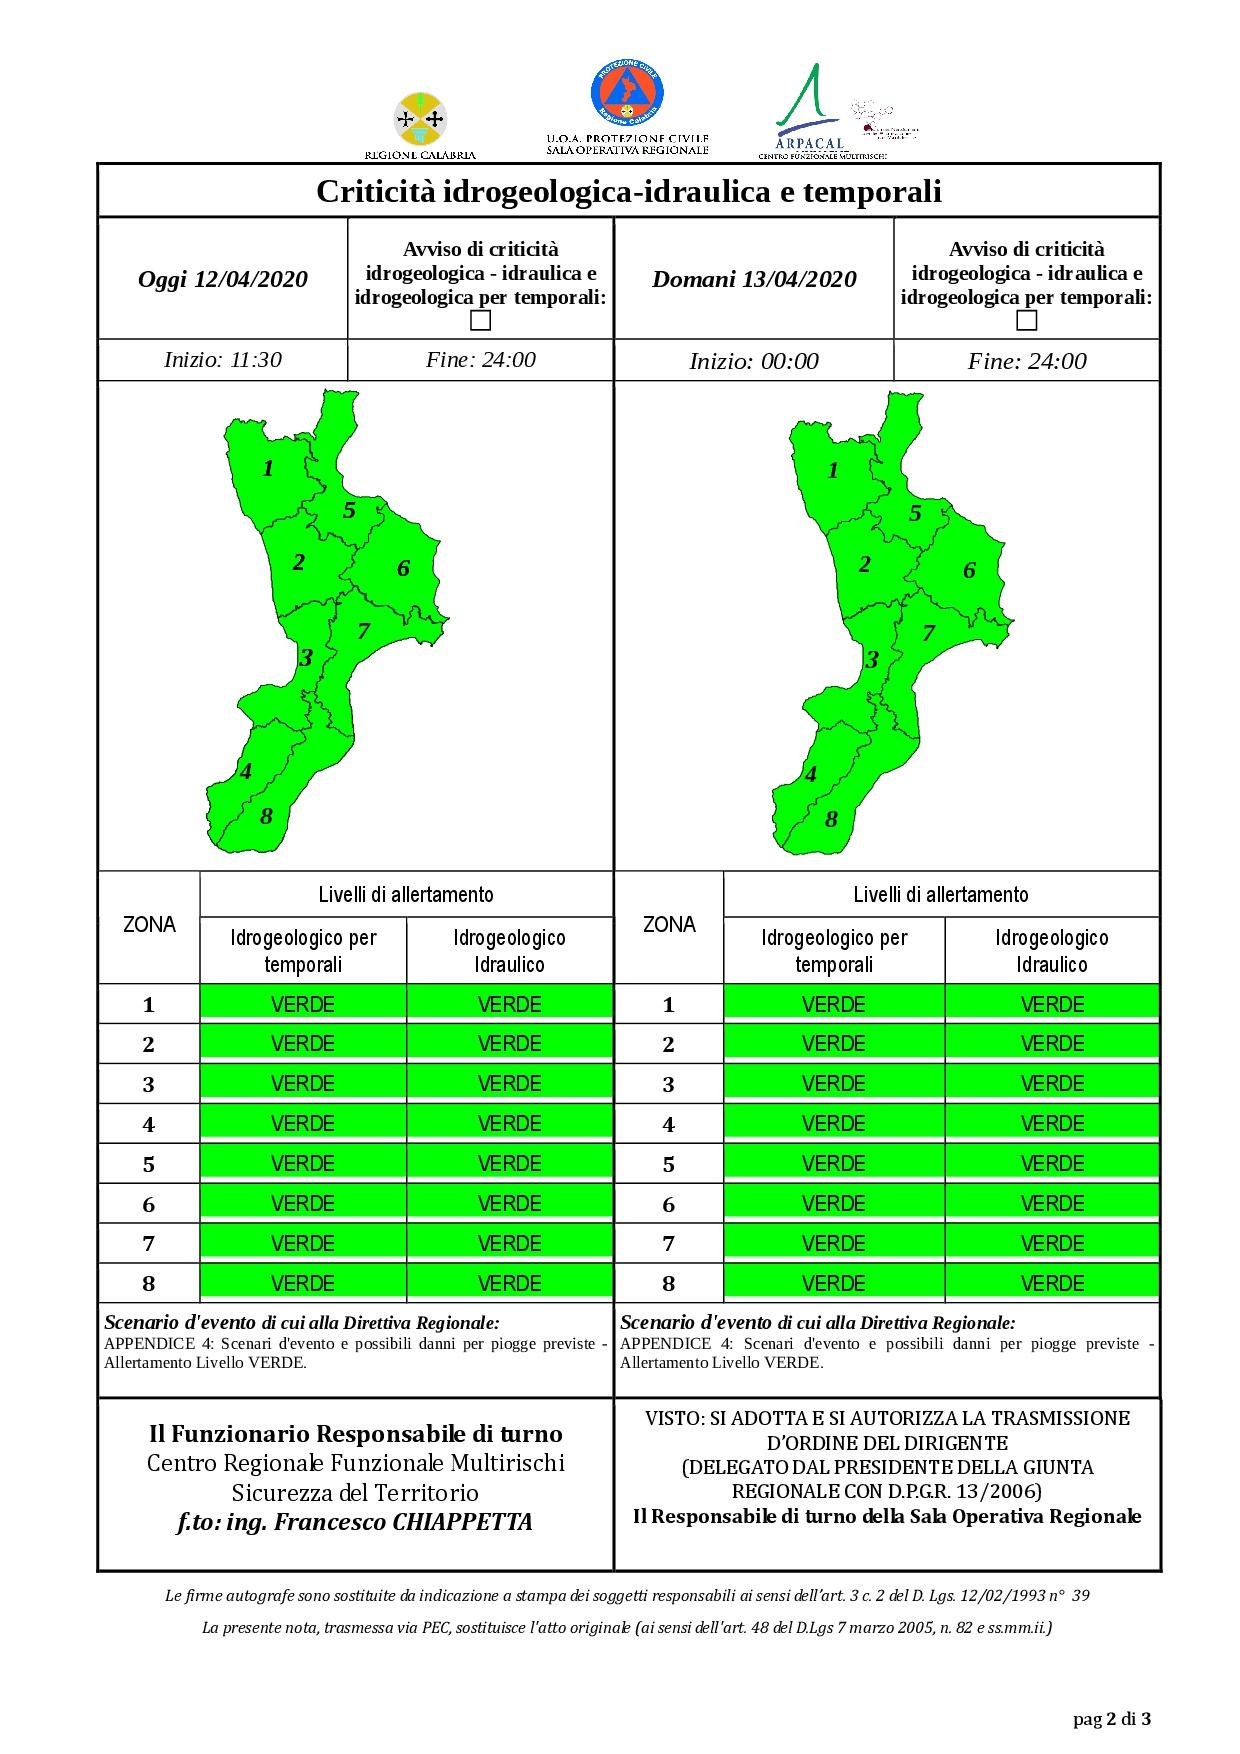 Criticità idrogeologica-idraulica e temporali in Calabria 12-04-2020